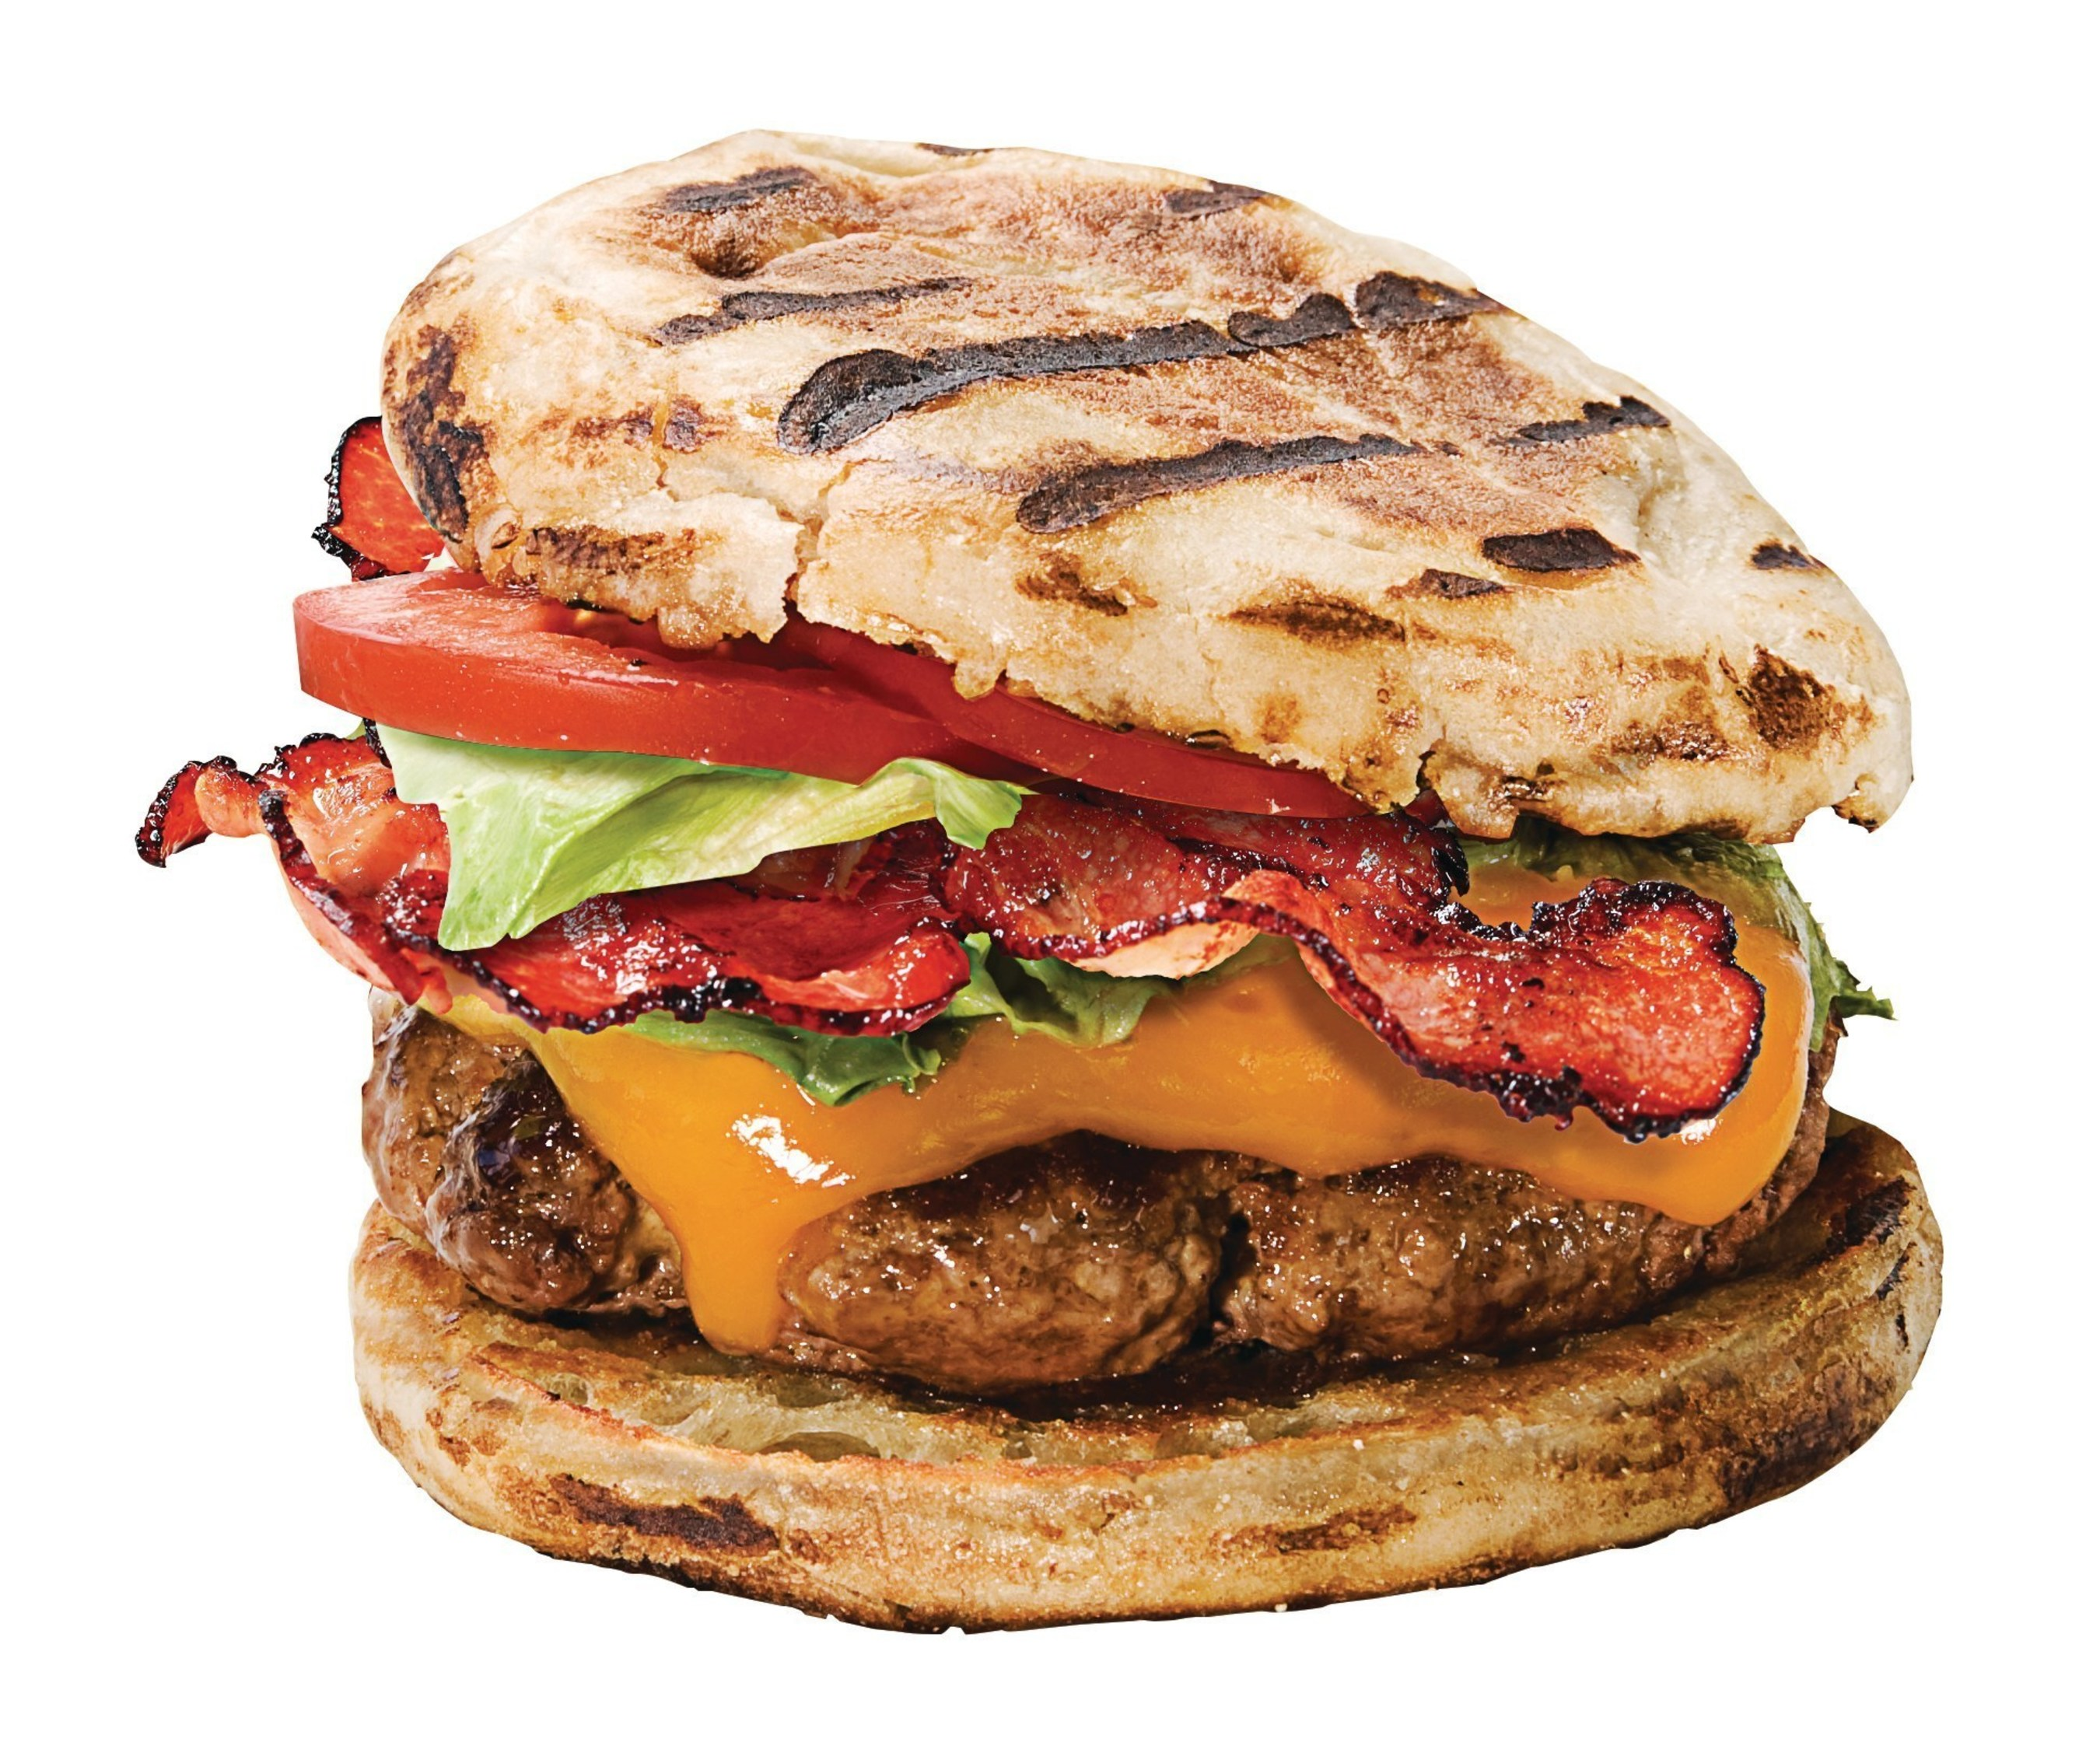 Thomas' Grillers XL English Muffins Burger Image